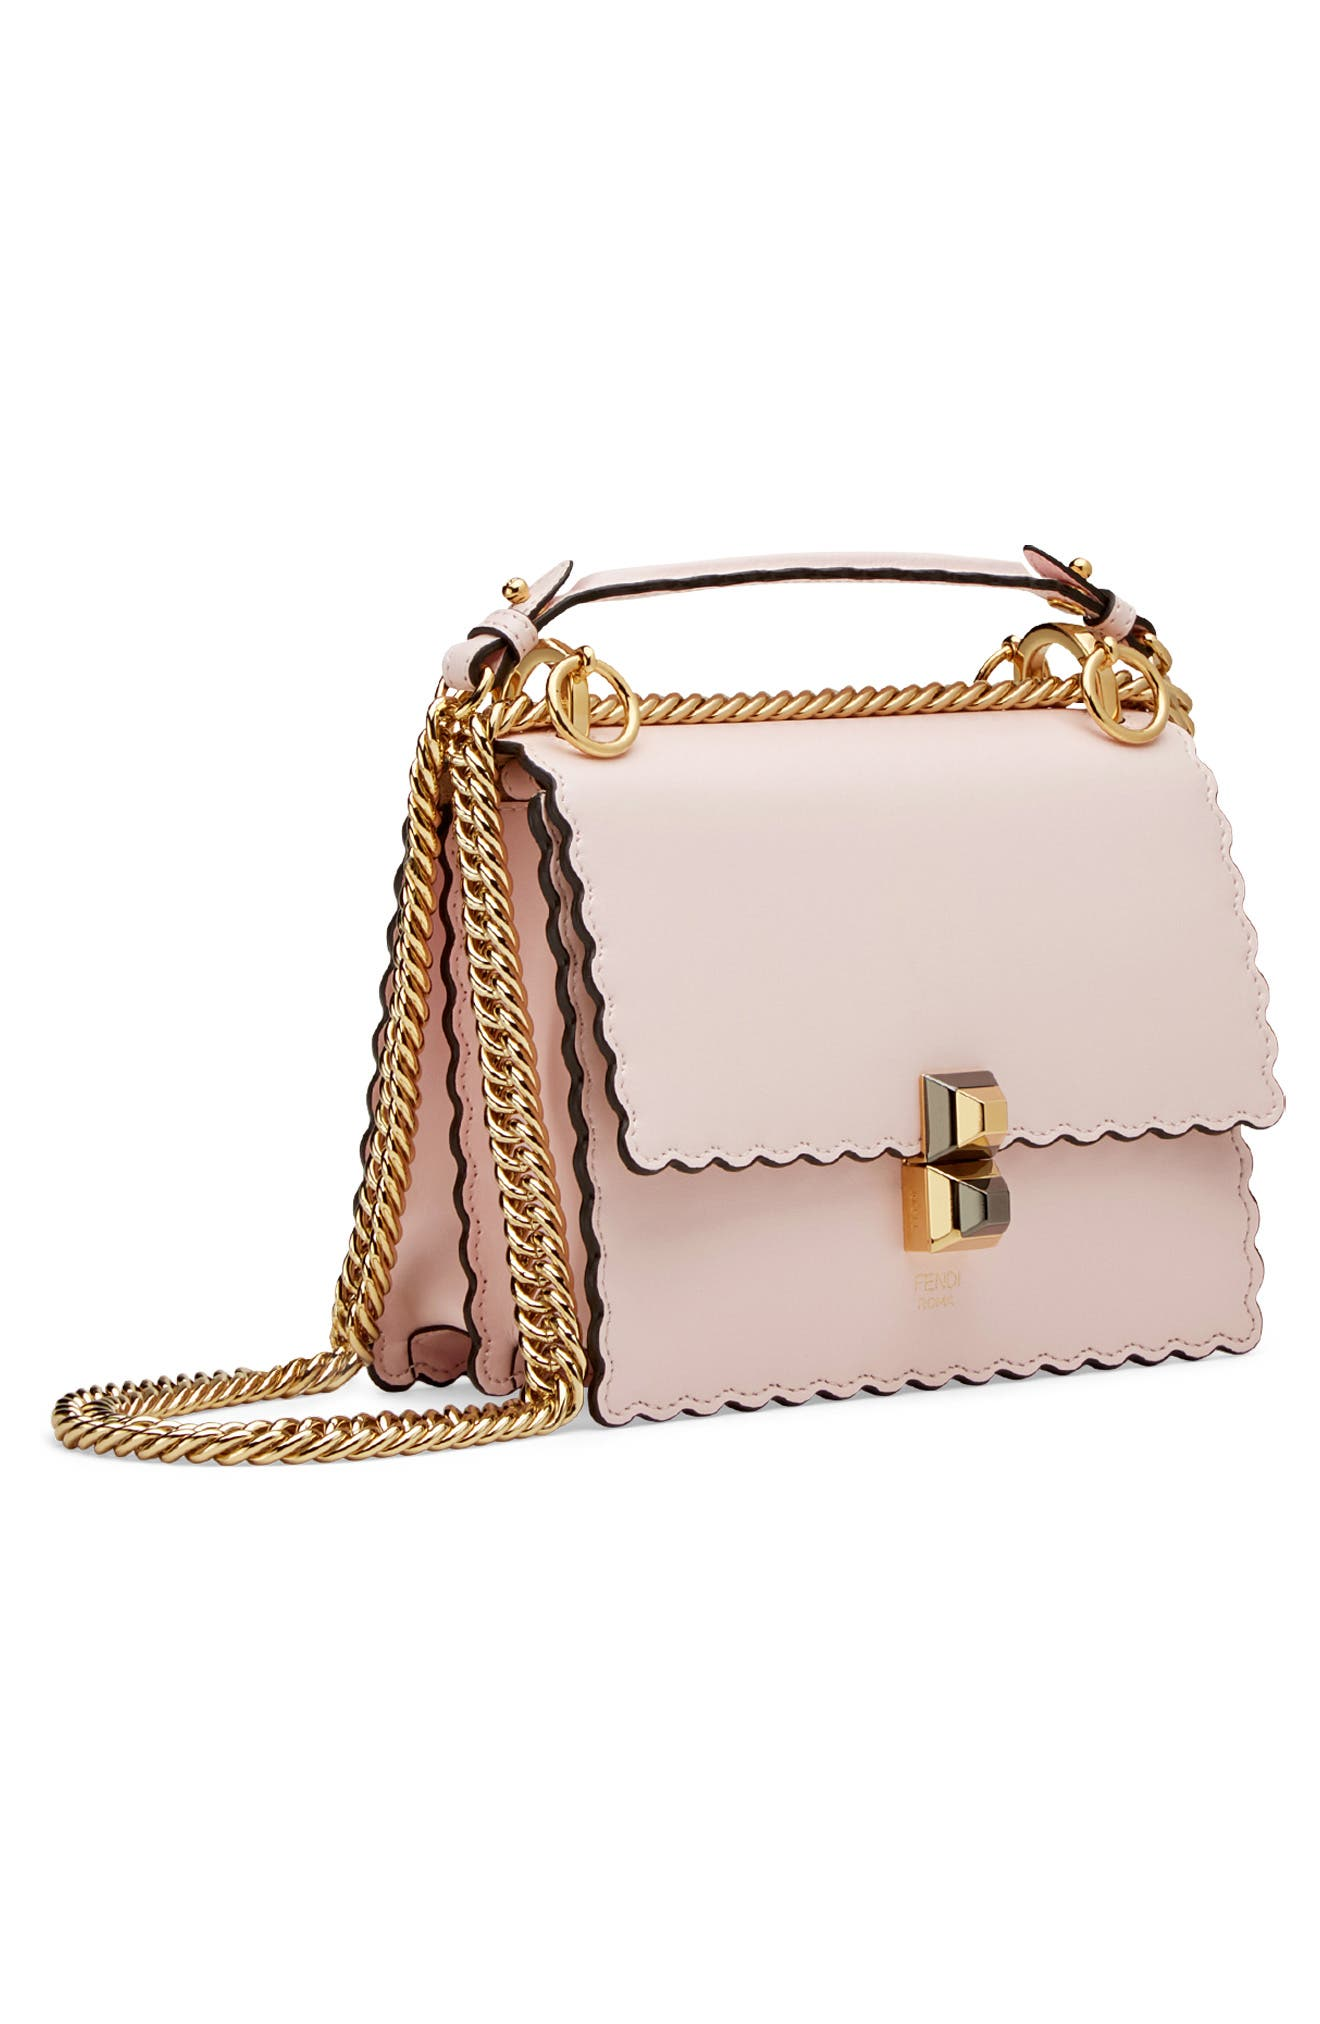 Mini Kan I Scalloped Leather Shoulder Bag,                             Alternate thumbnail 4, color,                             CONFETTO/ ORO SOFT